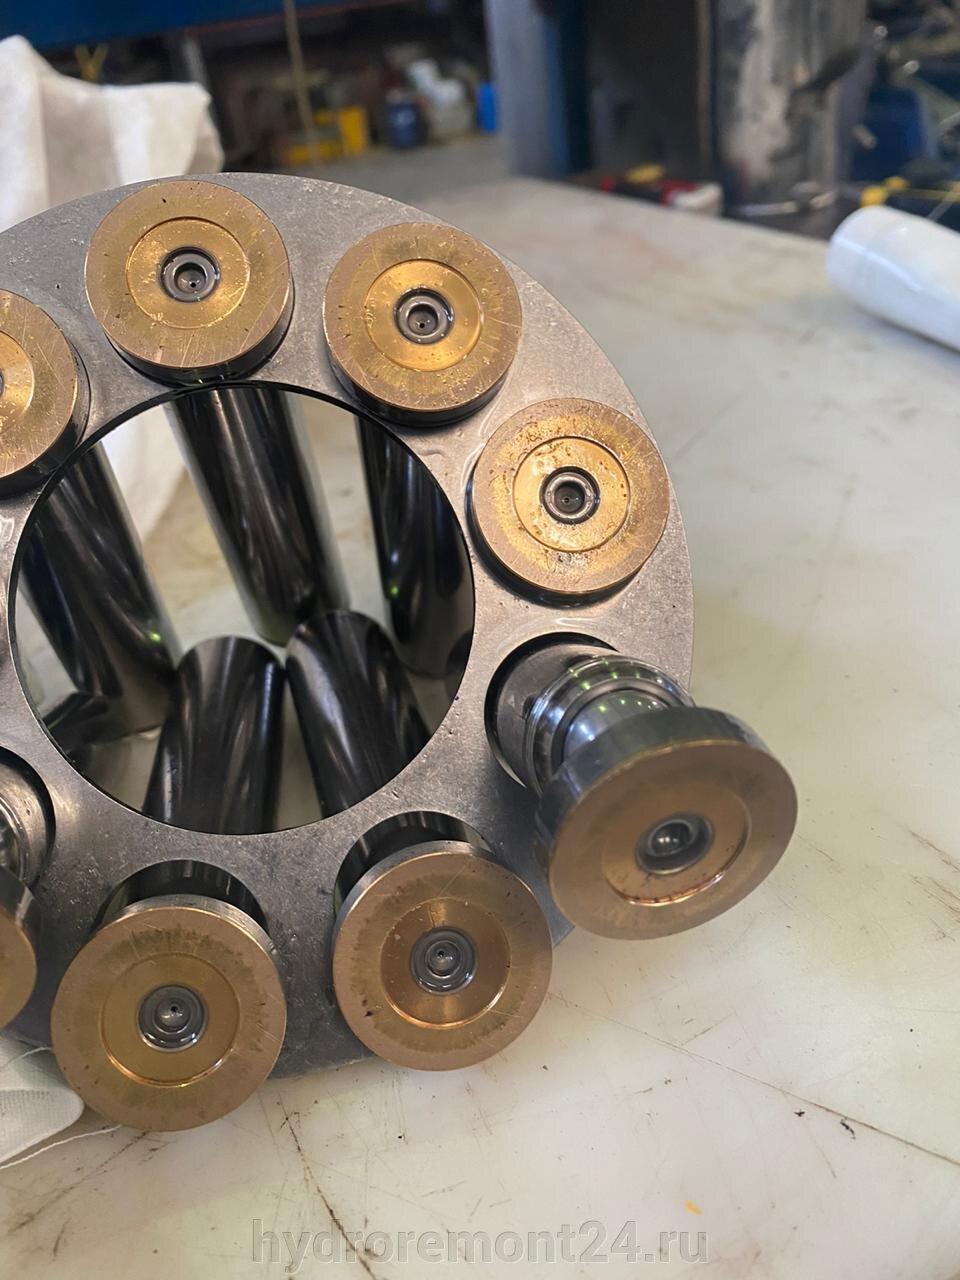 Ремонт гидромоторов спецтехники - фото pic_023cfba5e089cacdc7b7266ed530682e_1920x9000_1.jpg